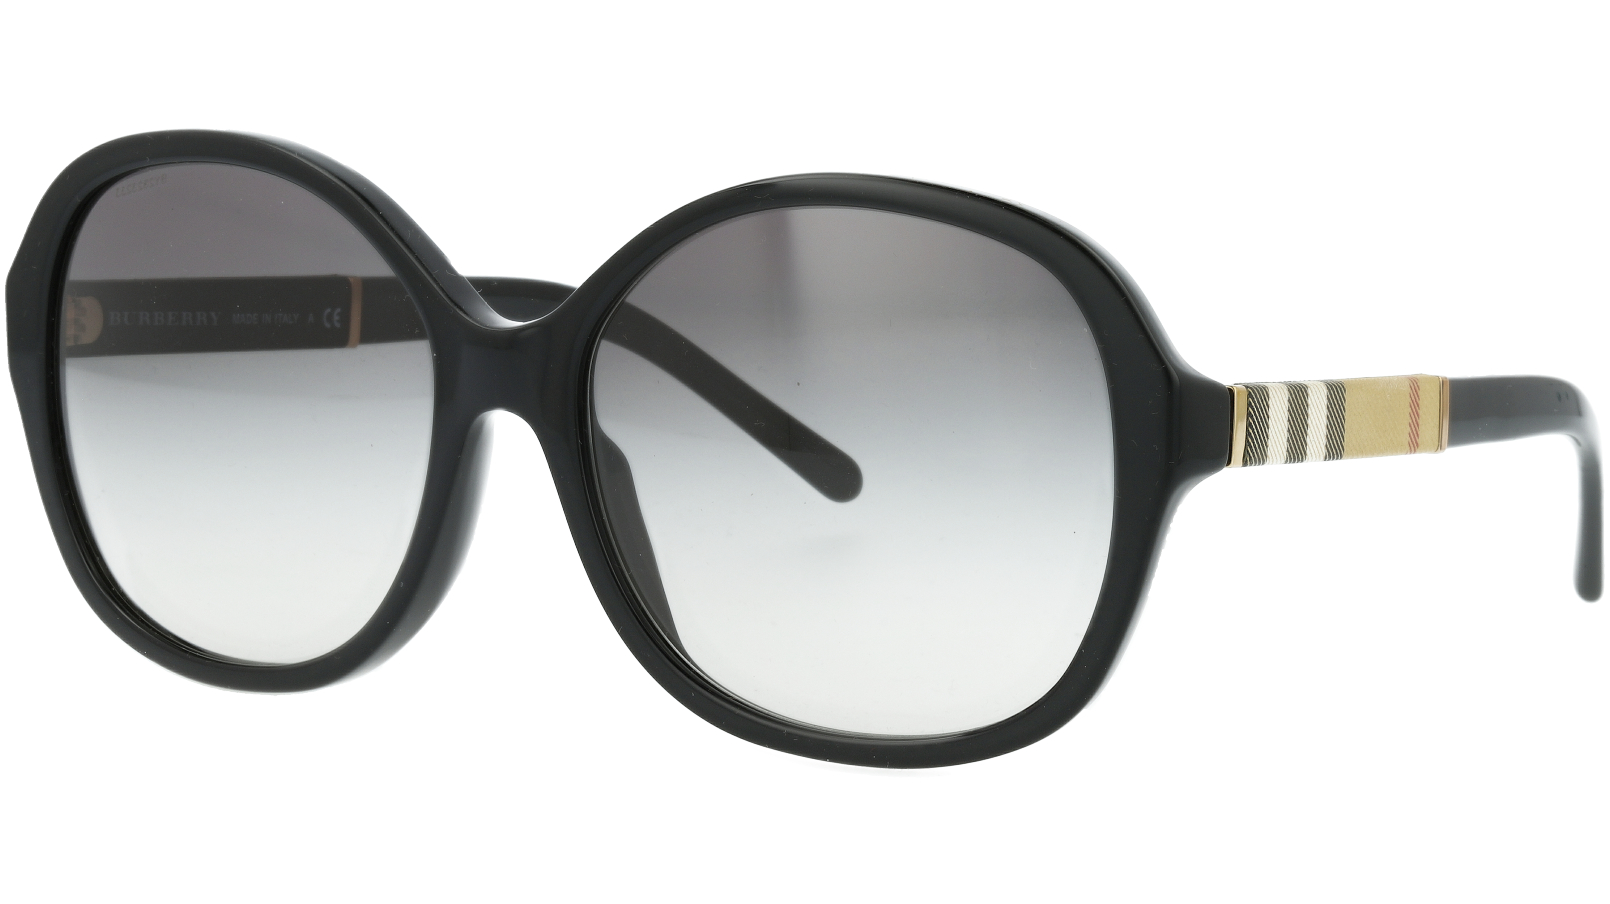 BURBERRY BE4178 300111 58 BLACK Sunglasses